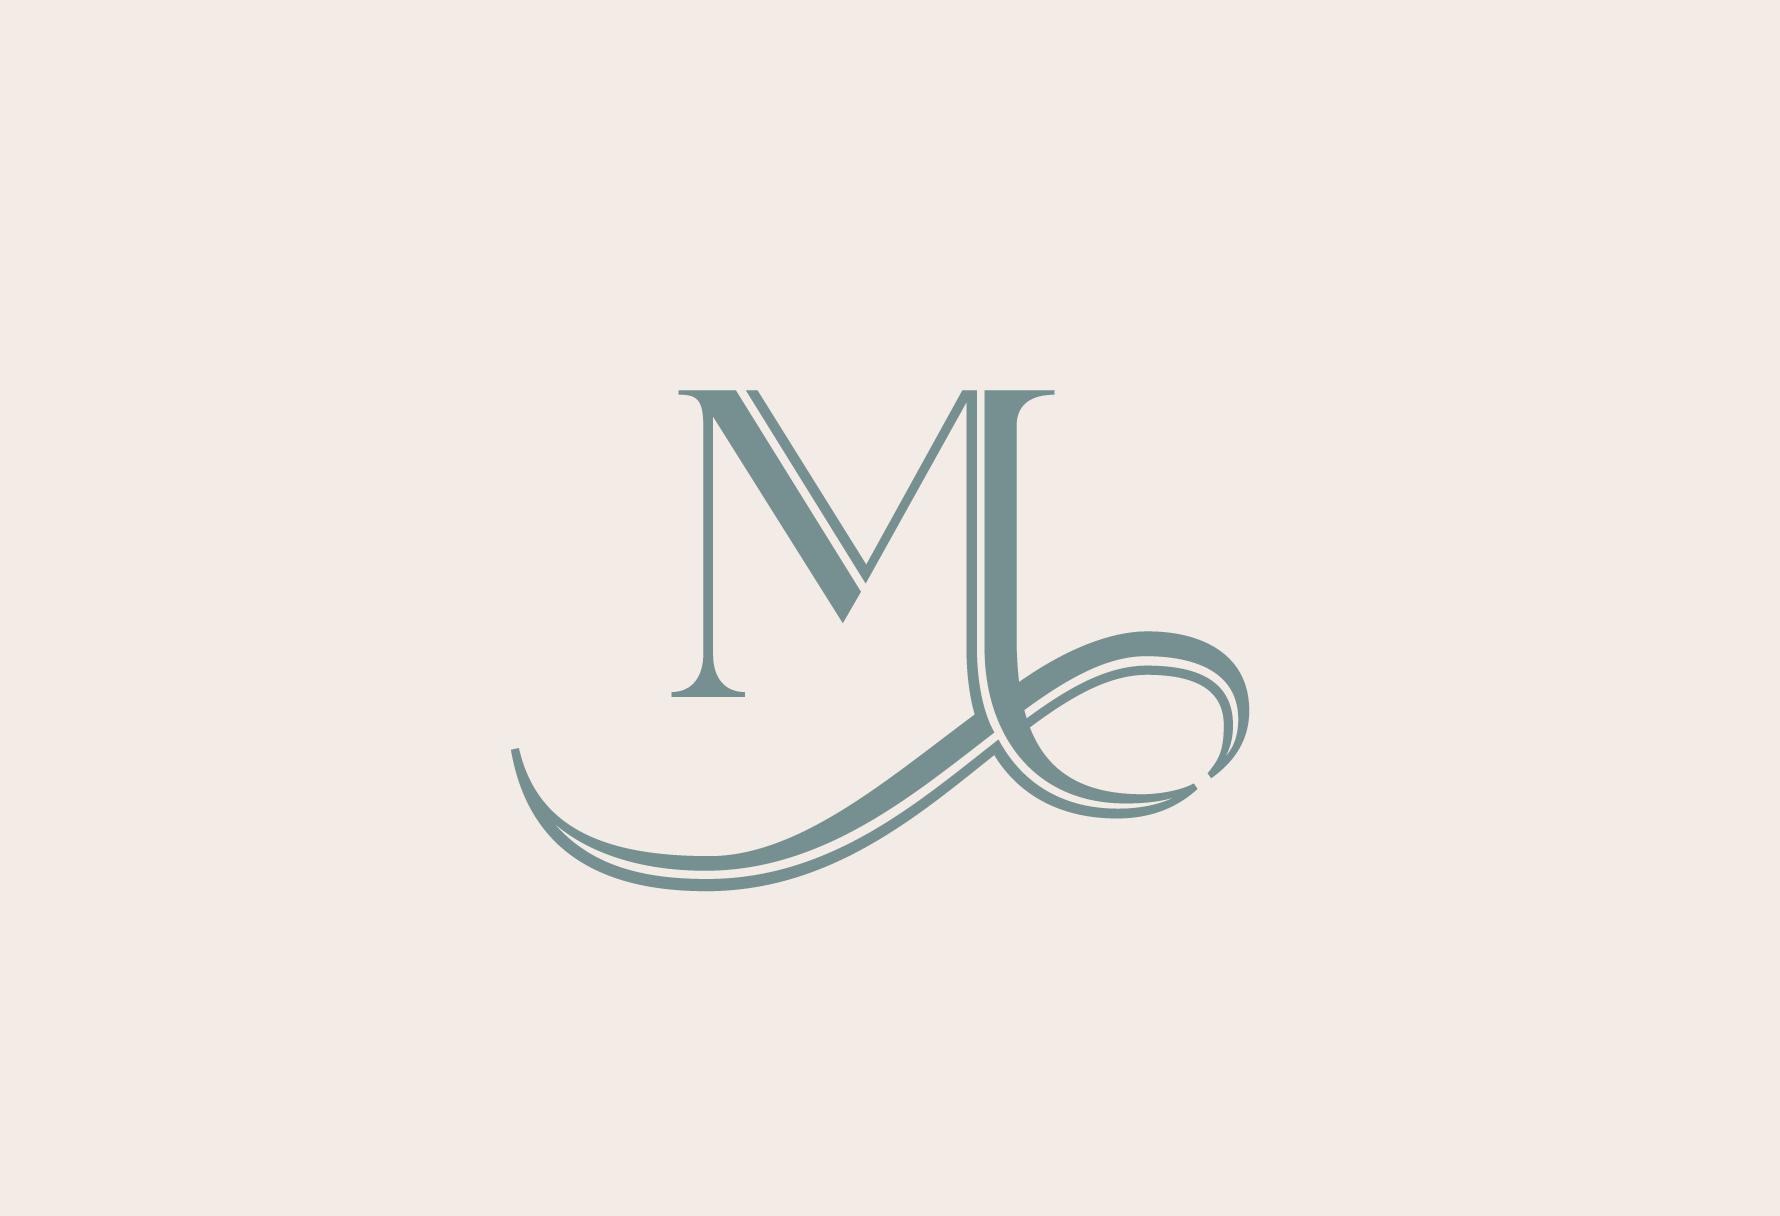 Mirna-Fashion-logotype-monogram